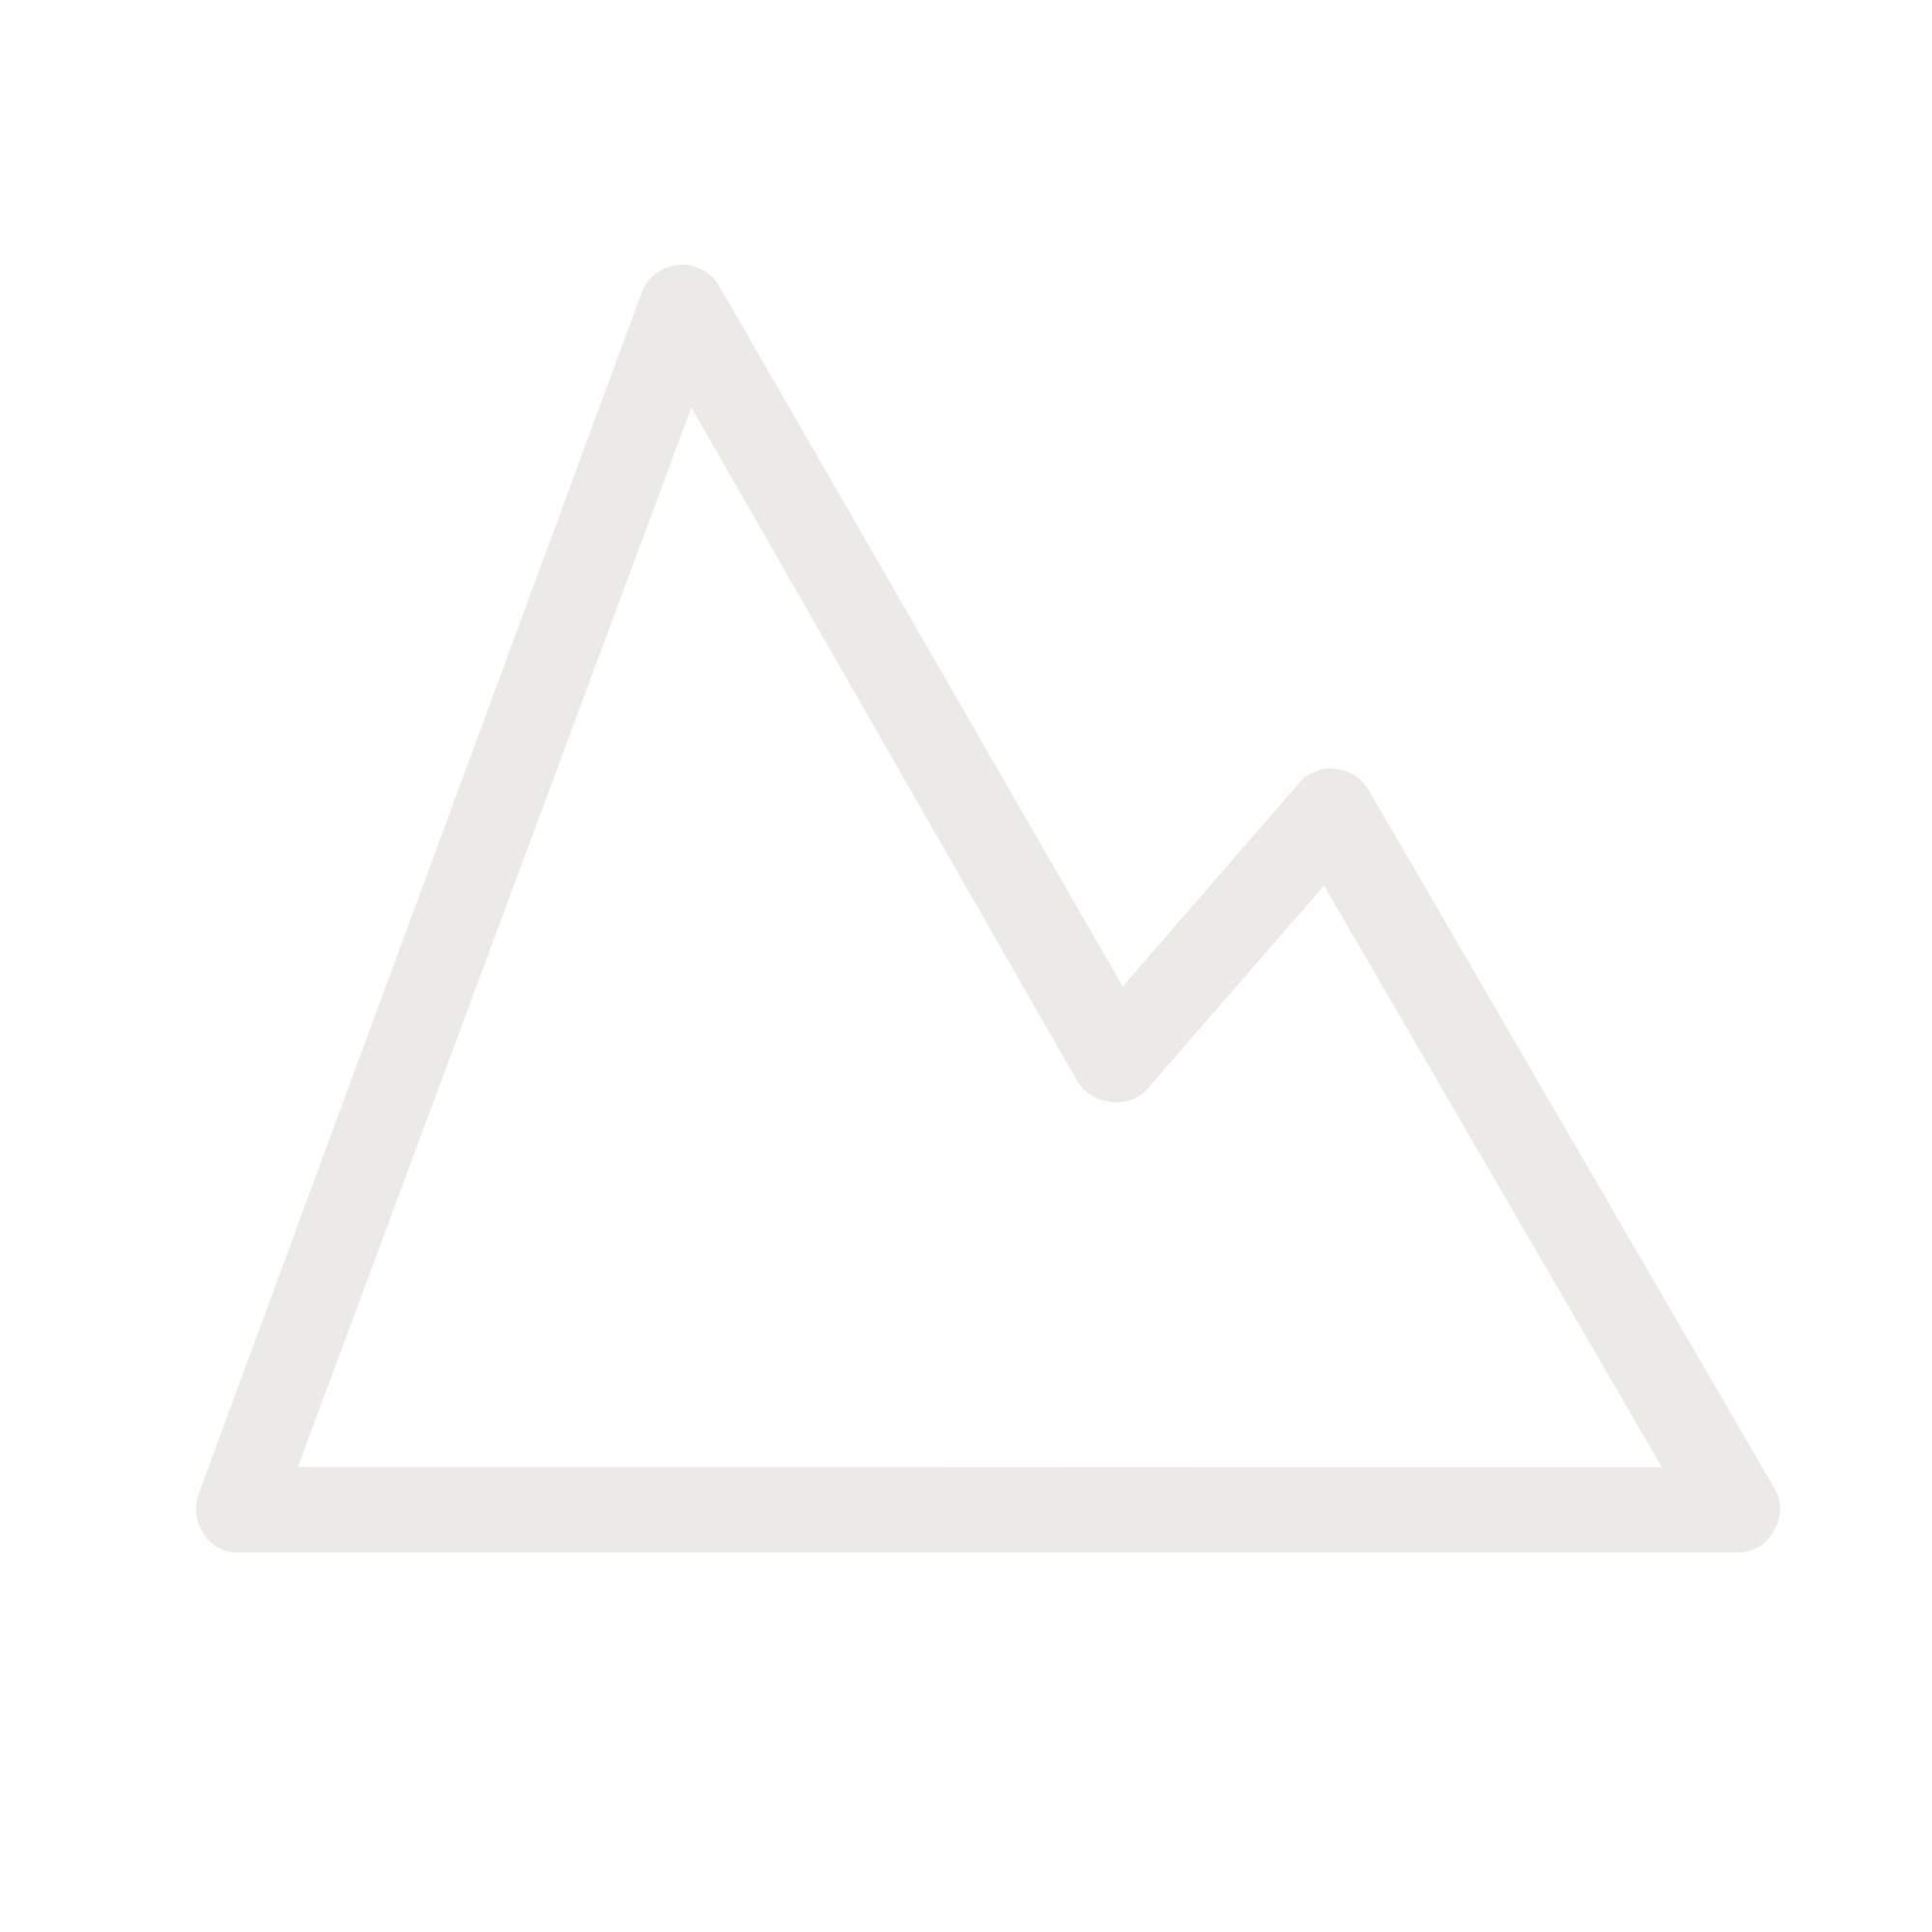 Lowa Tibet LL Preisvergleich - Wanderschuh - Günstig